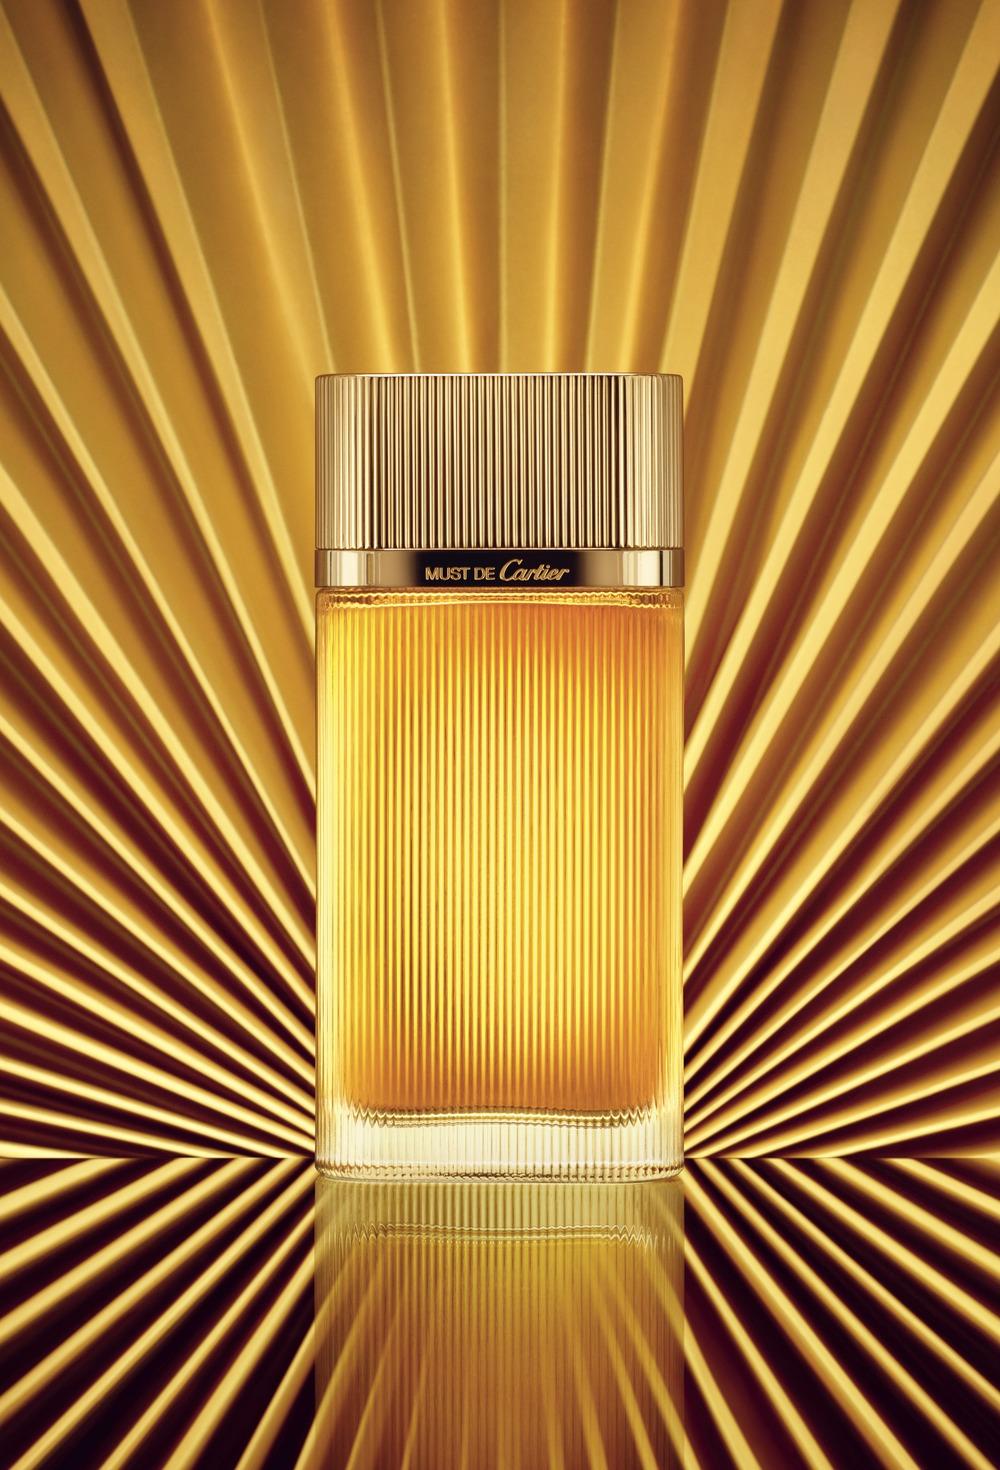 0ed3add1593 Must de Cartier Gold Cartier perfume - a fragrância Feminino 2015